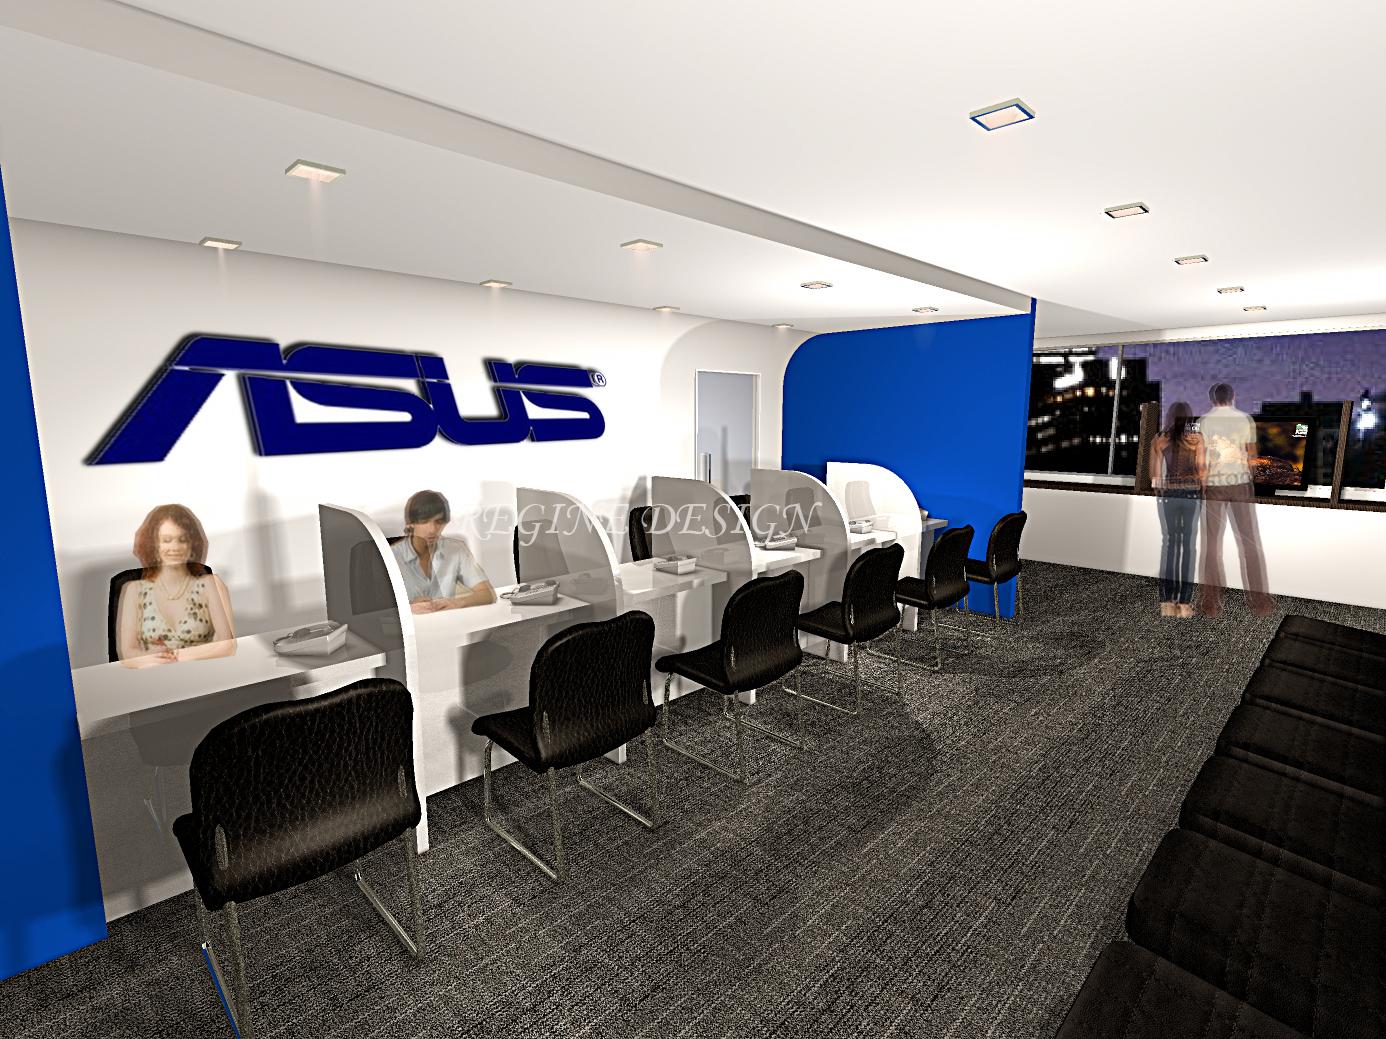 Asus service center region interior design for Interior decoration design services